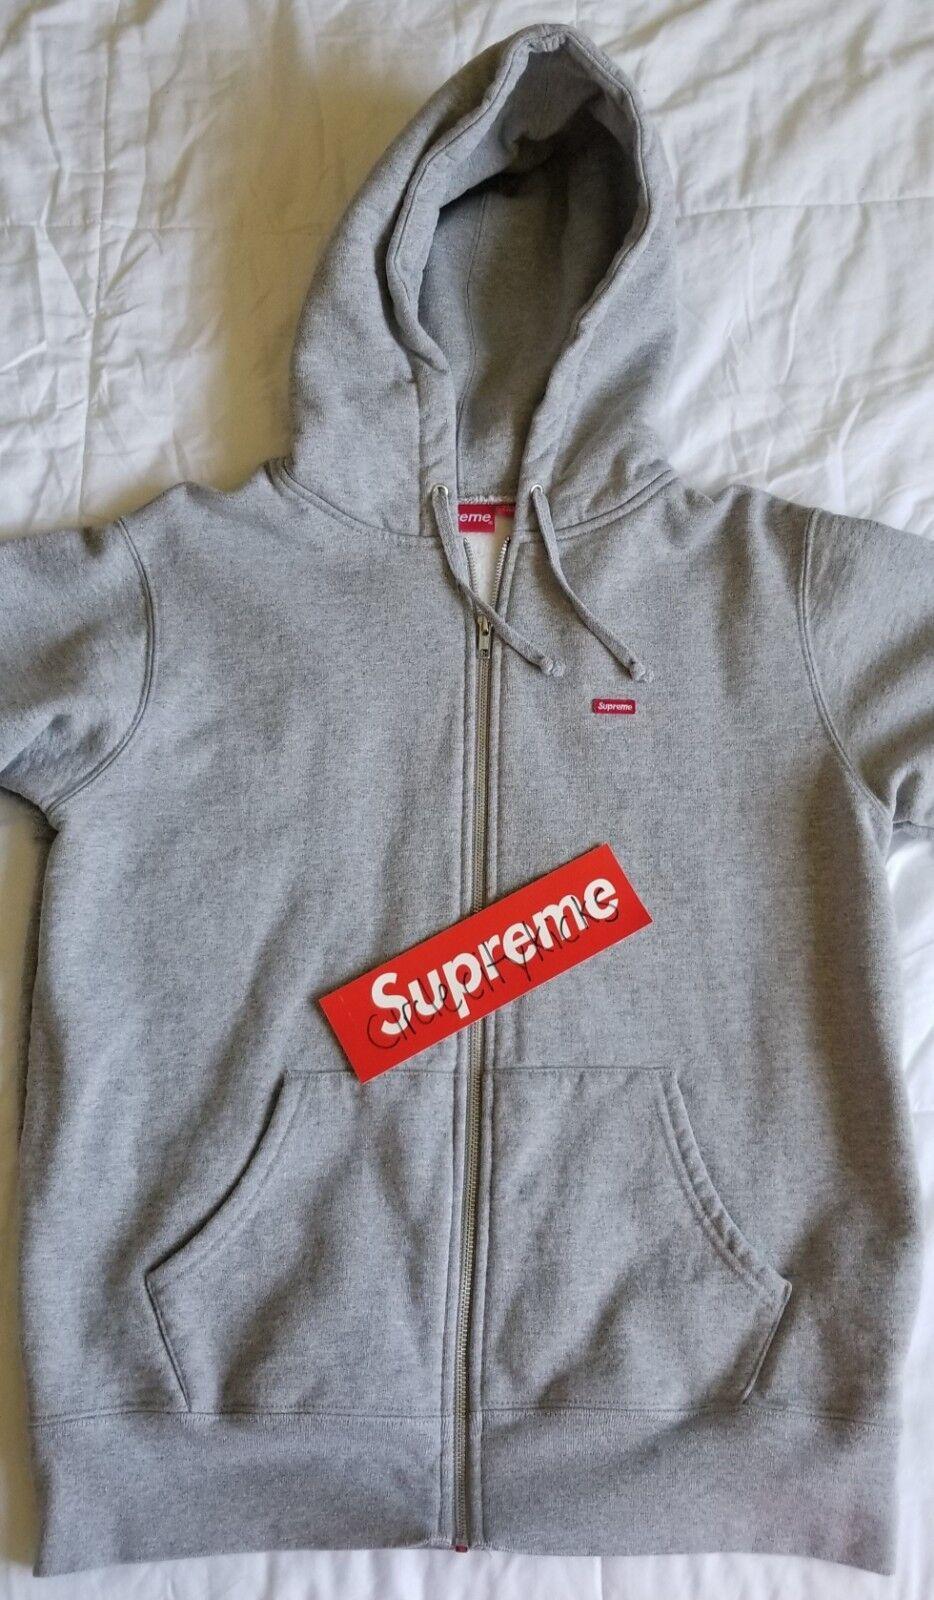 Supreme Small Box Logo Zip Up Hooded Sweatshirt - Größe M Medium - grau - FW17